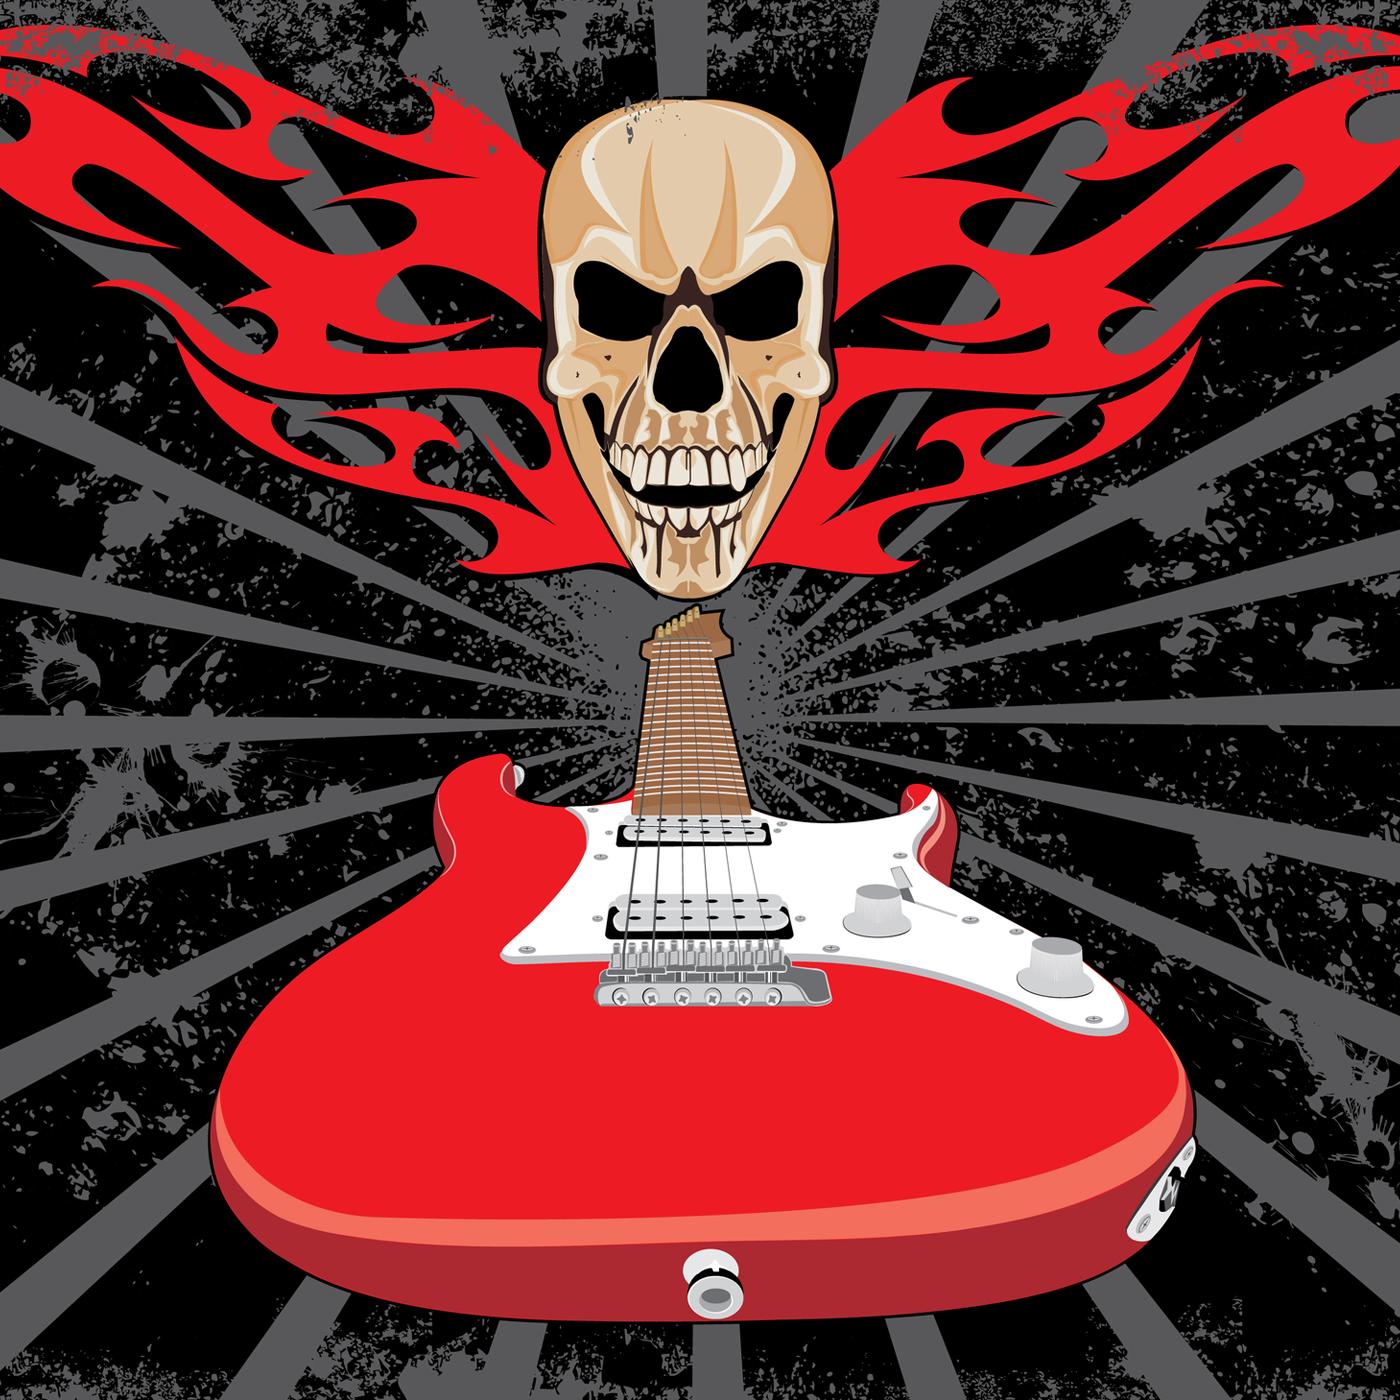 melodic death metal on rockradiocom rockradiocom